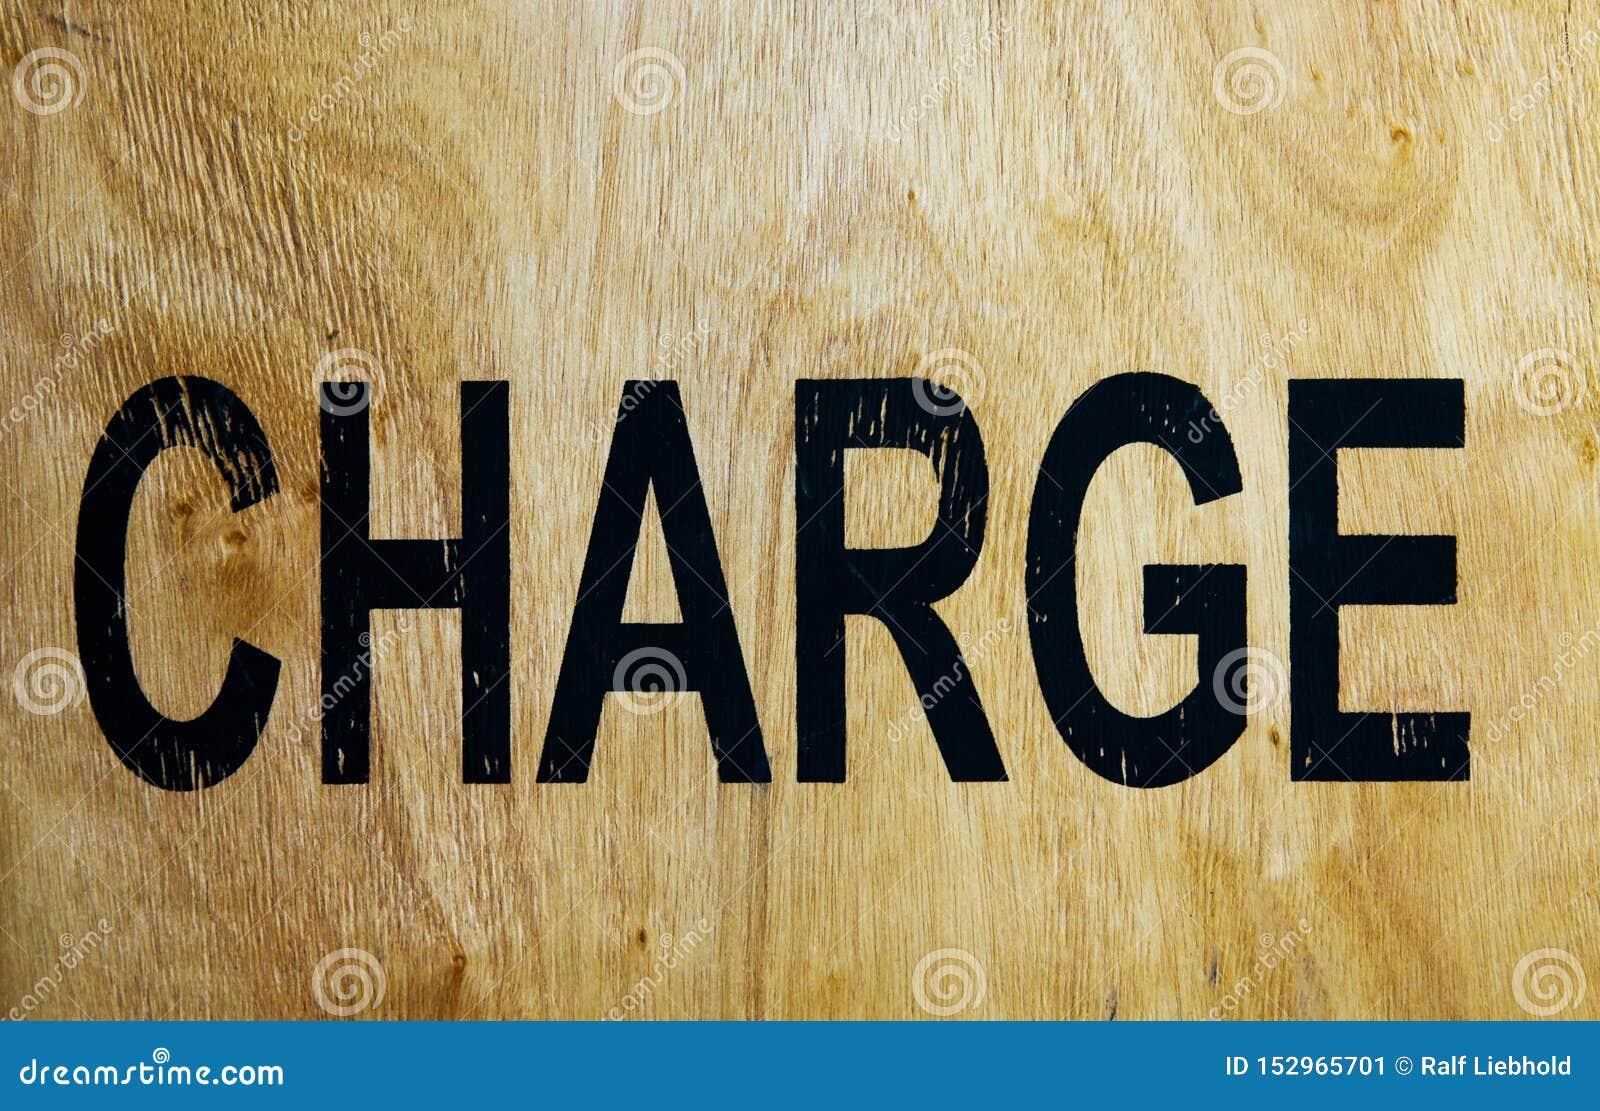 Word charge printed on old brown wood box